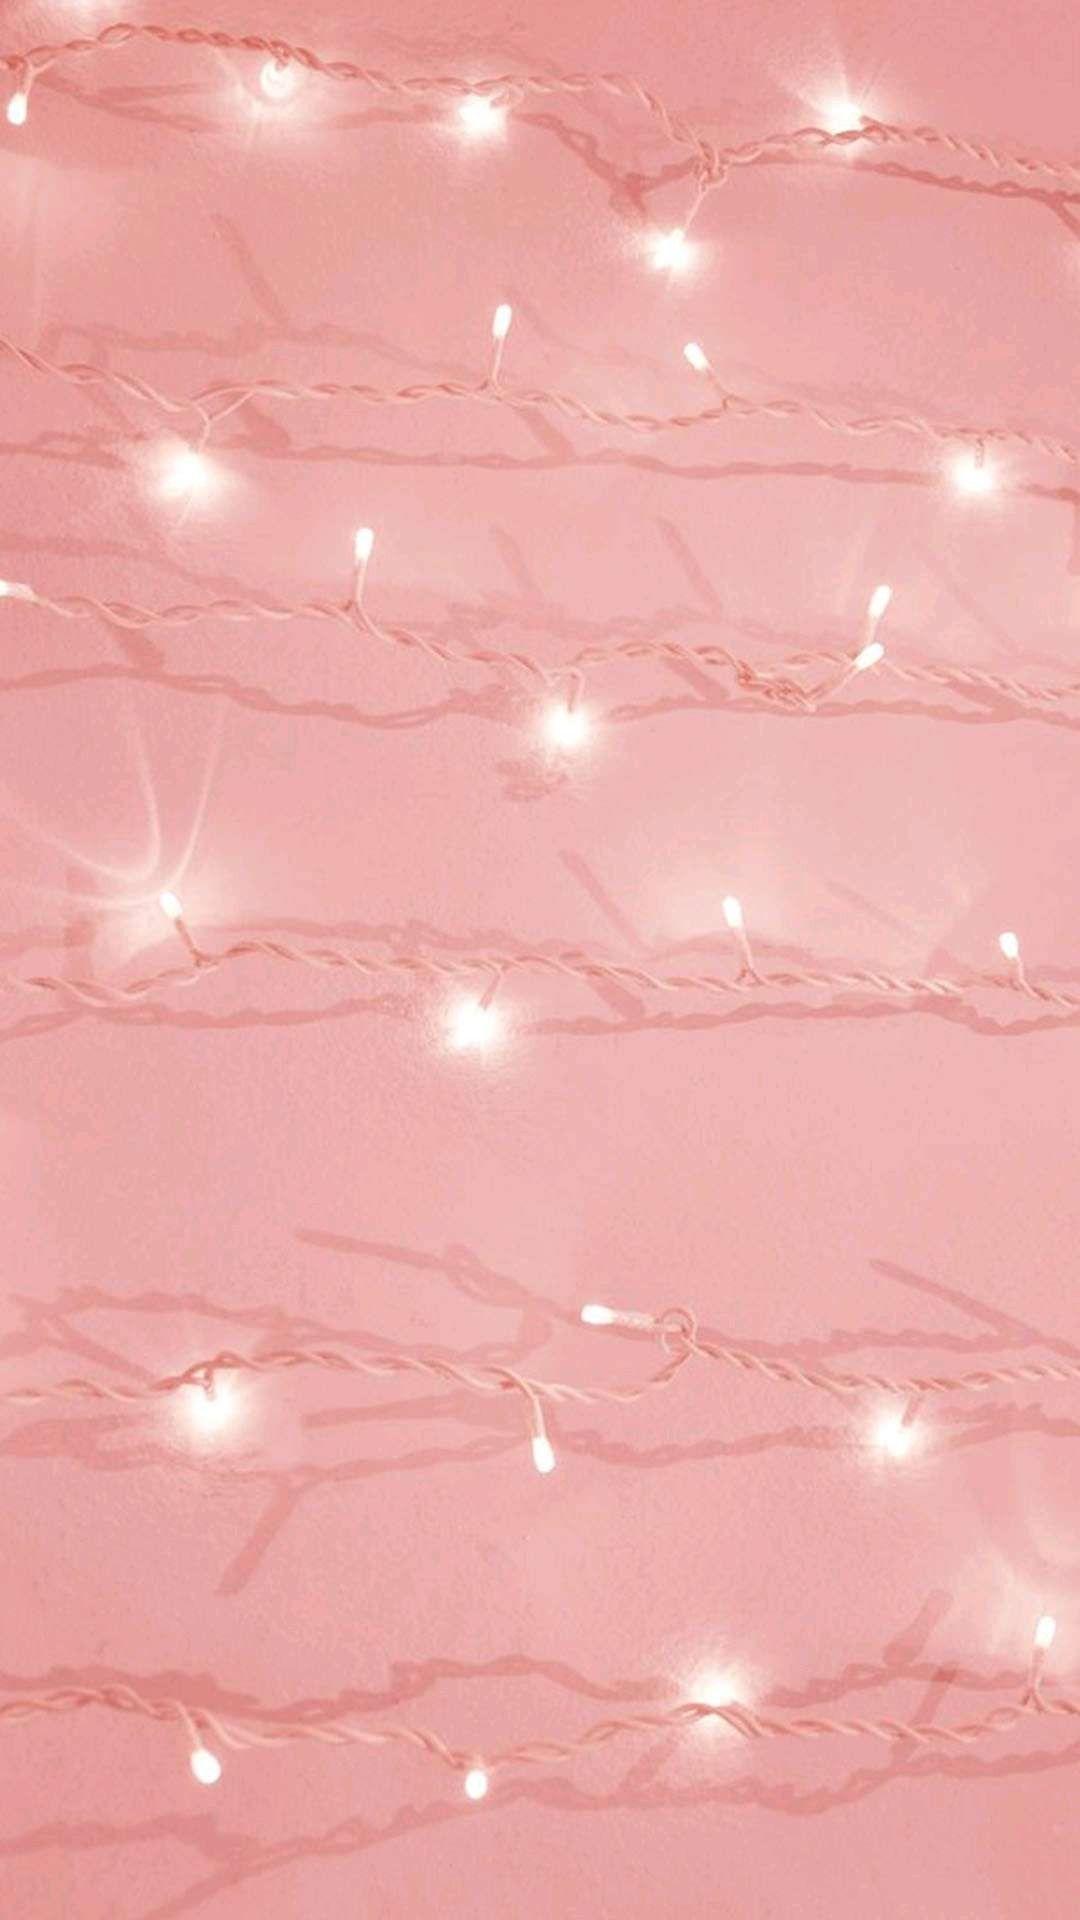 Pastel Aesthetic Rose Wallpapers Top Free Pastel Aesthetic Rose Pink Wallpaper Backgrounds Pink Wallpaper Iphone Pink Wallpaper